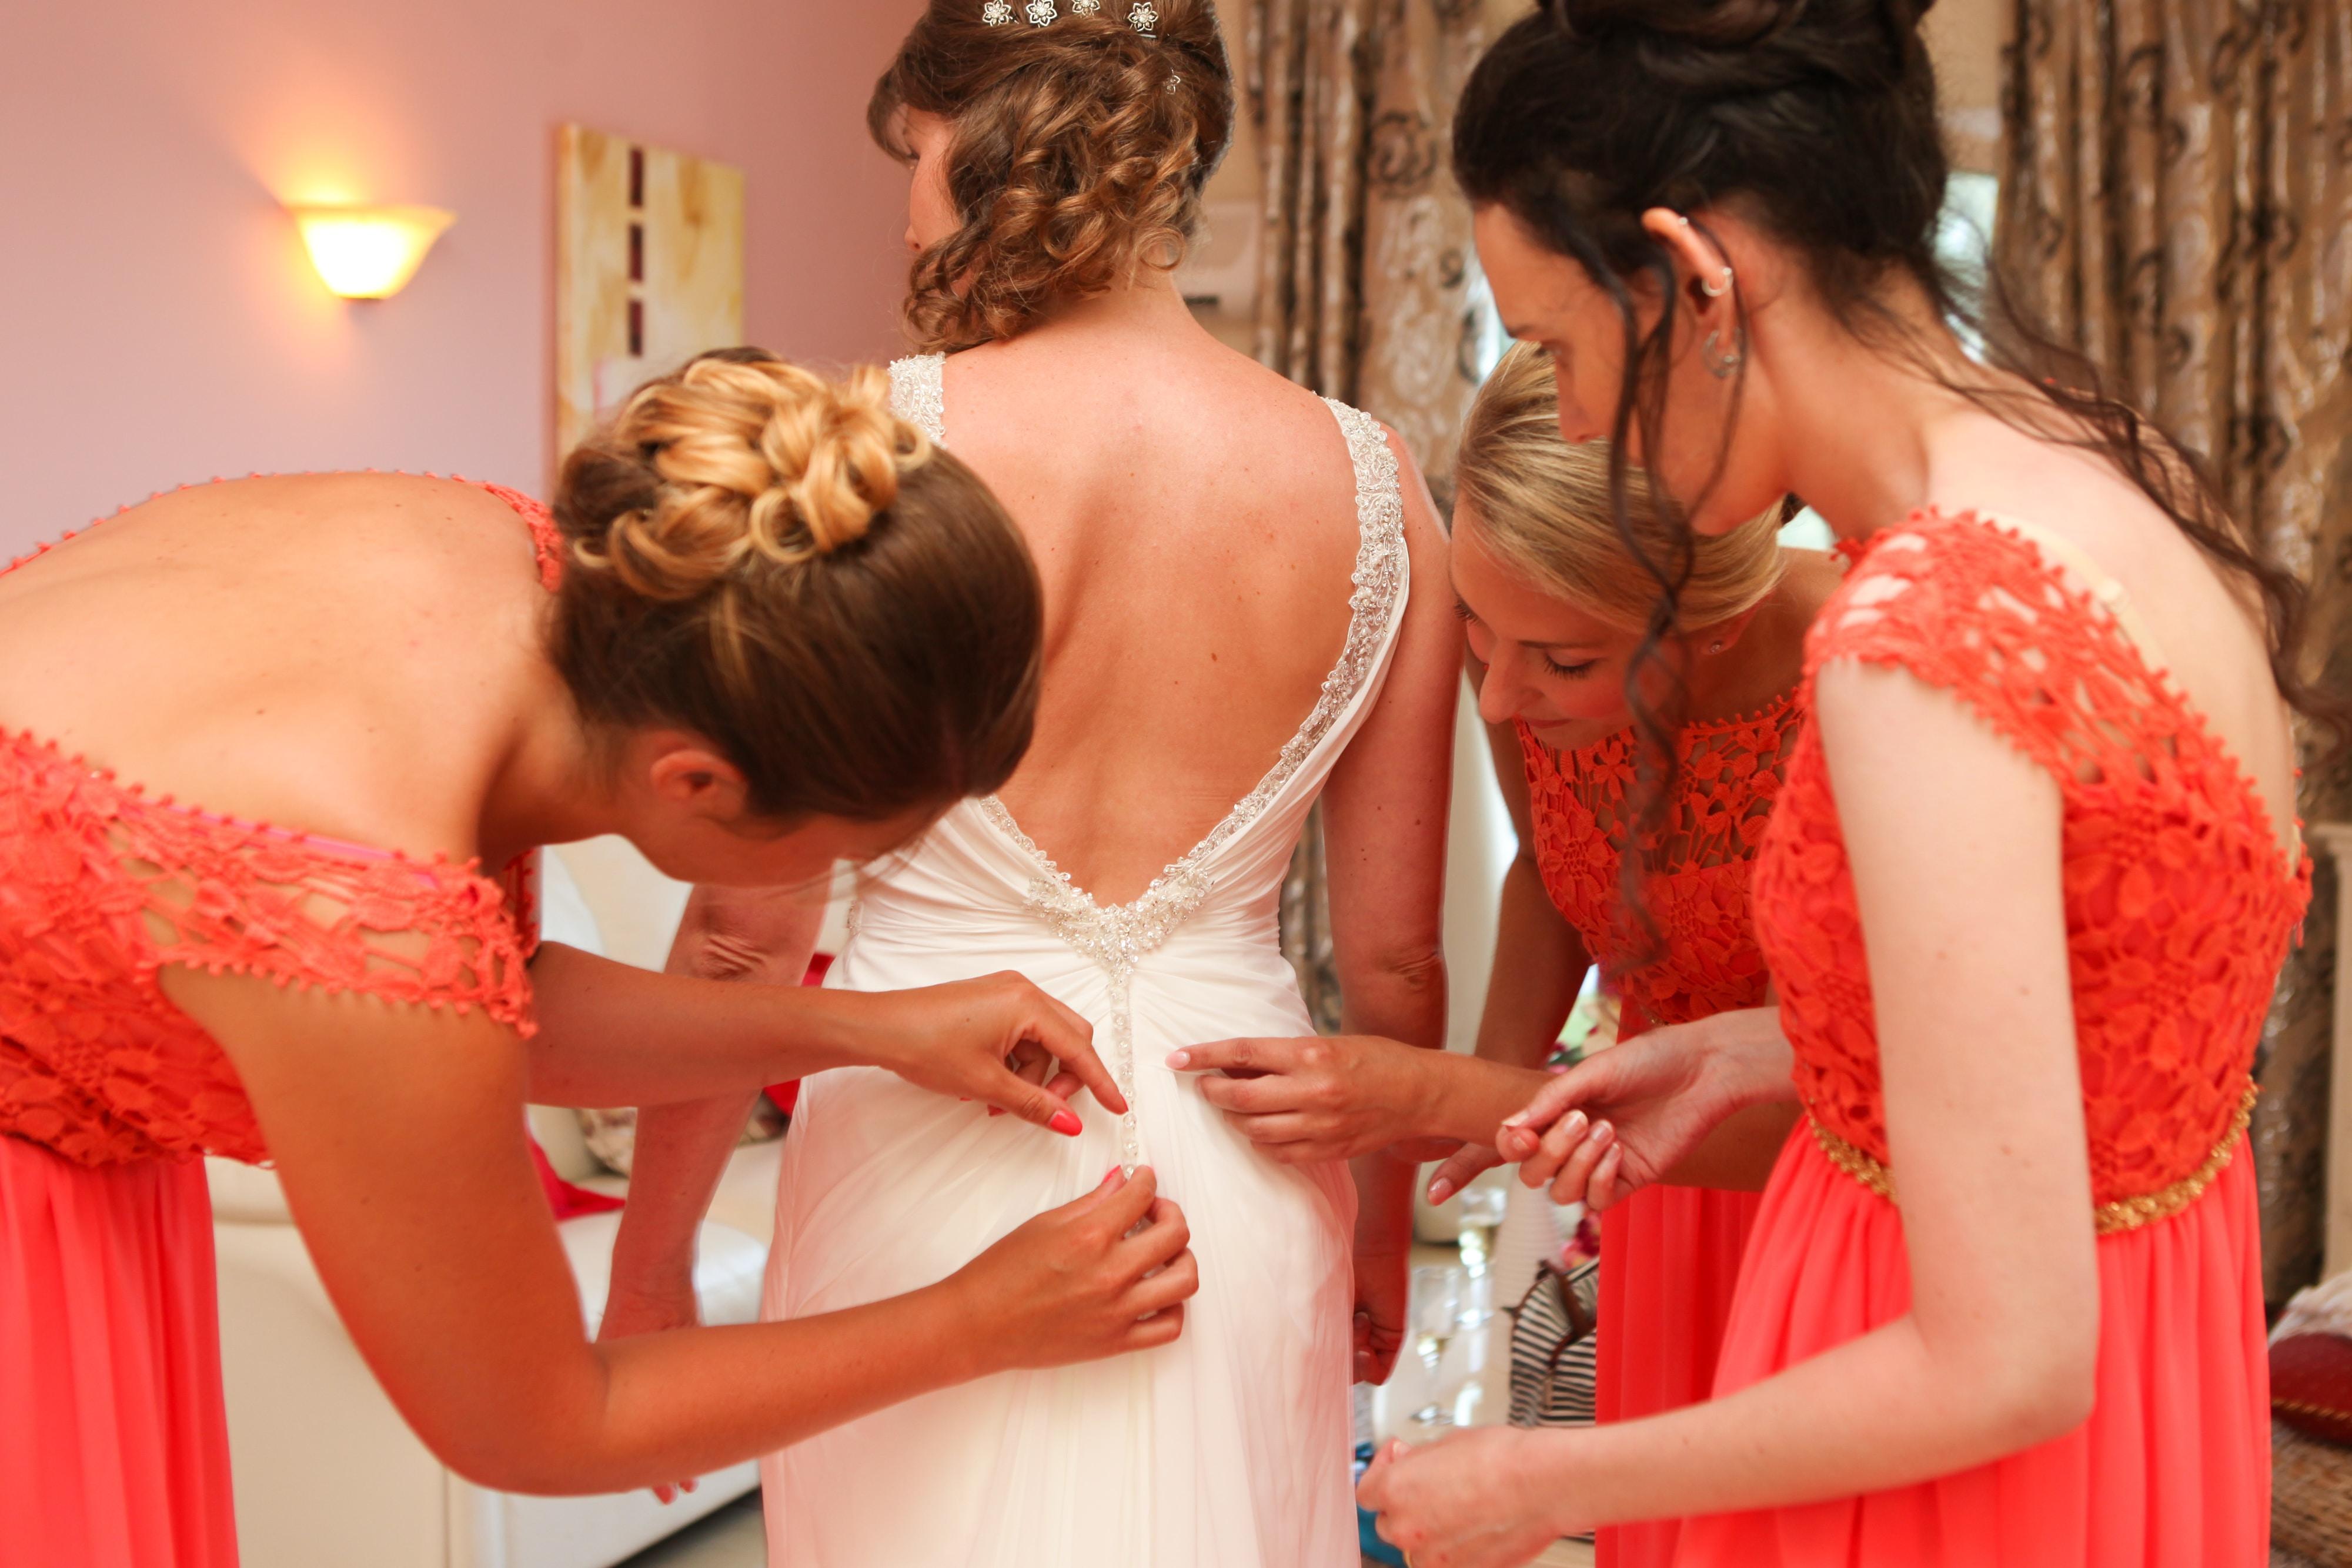 three women's fixing wedding gown